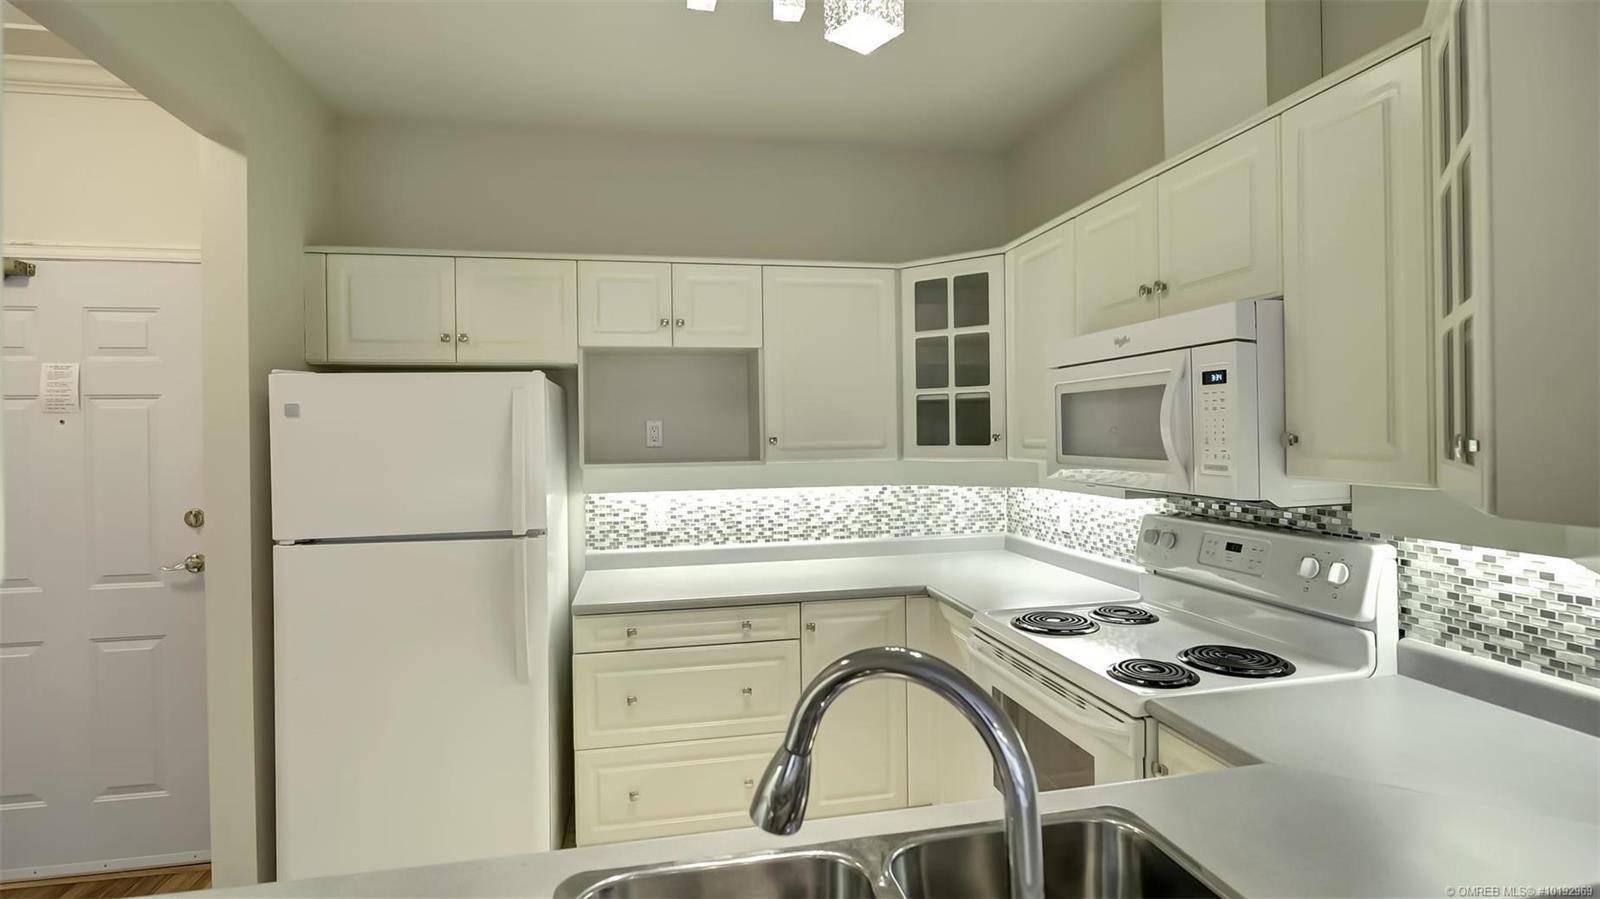 Condo for sale at 877 Klo Rd Unit 318 Kelowna British Columbia - MLS: 10192969